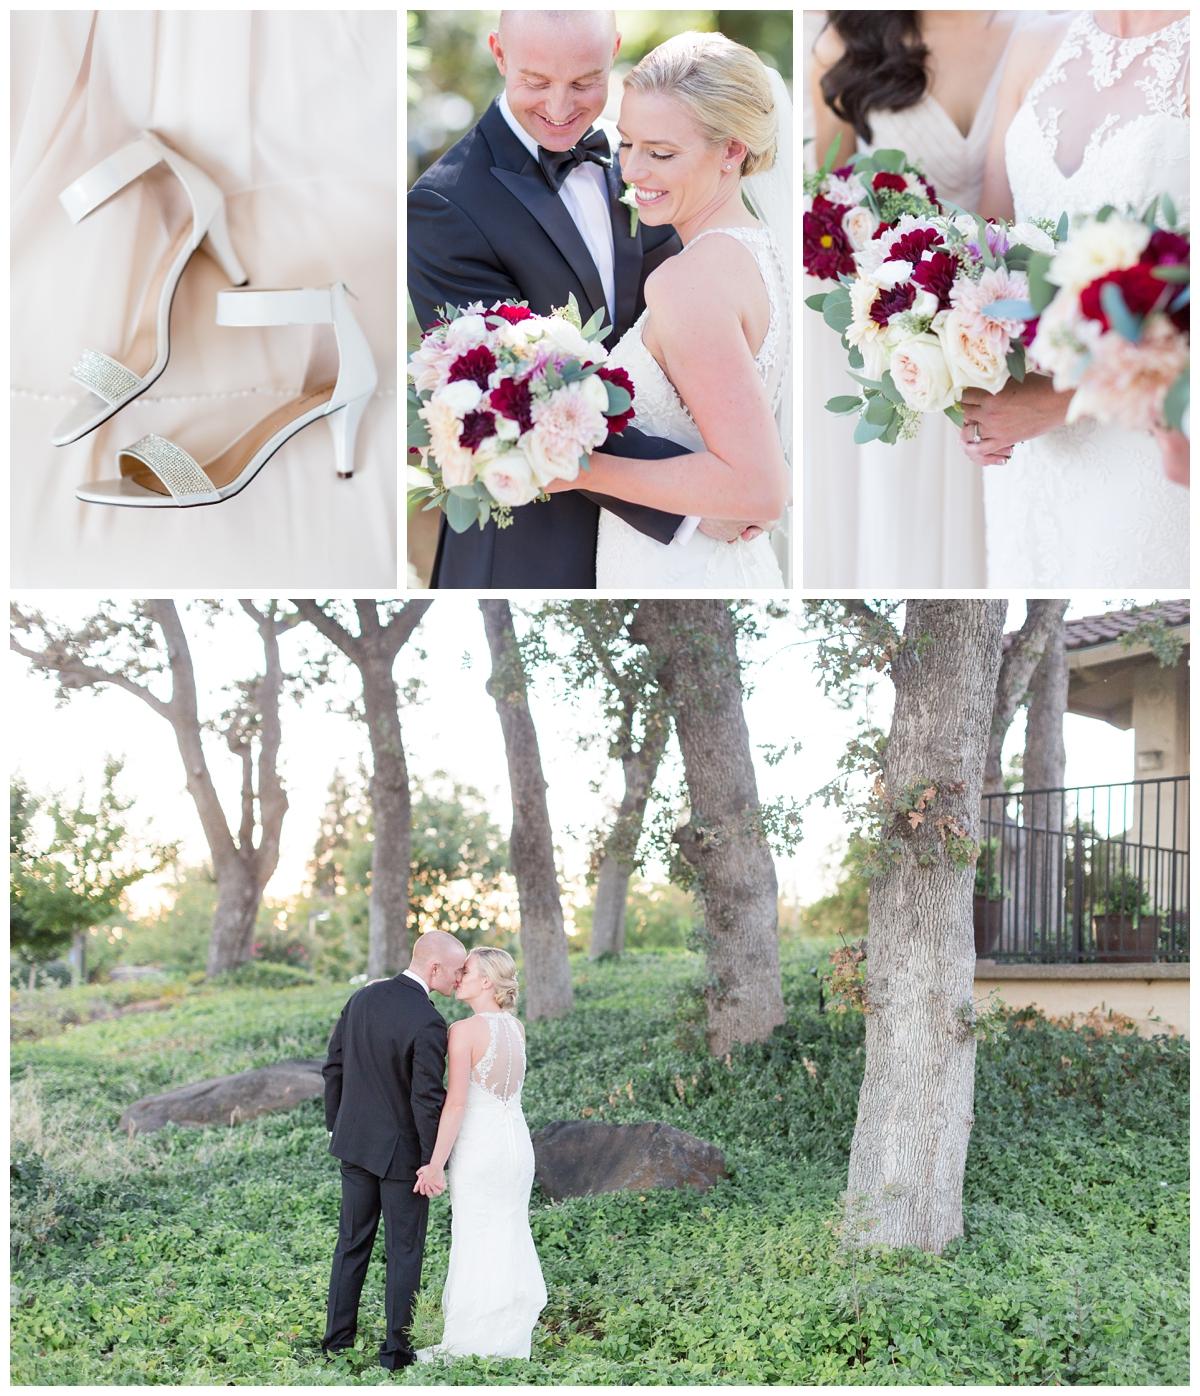 Lakeside-Pavilion-Wedding-Photographer_2872.jpg